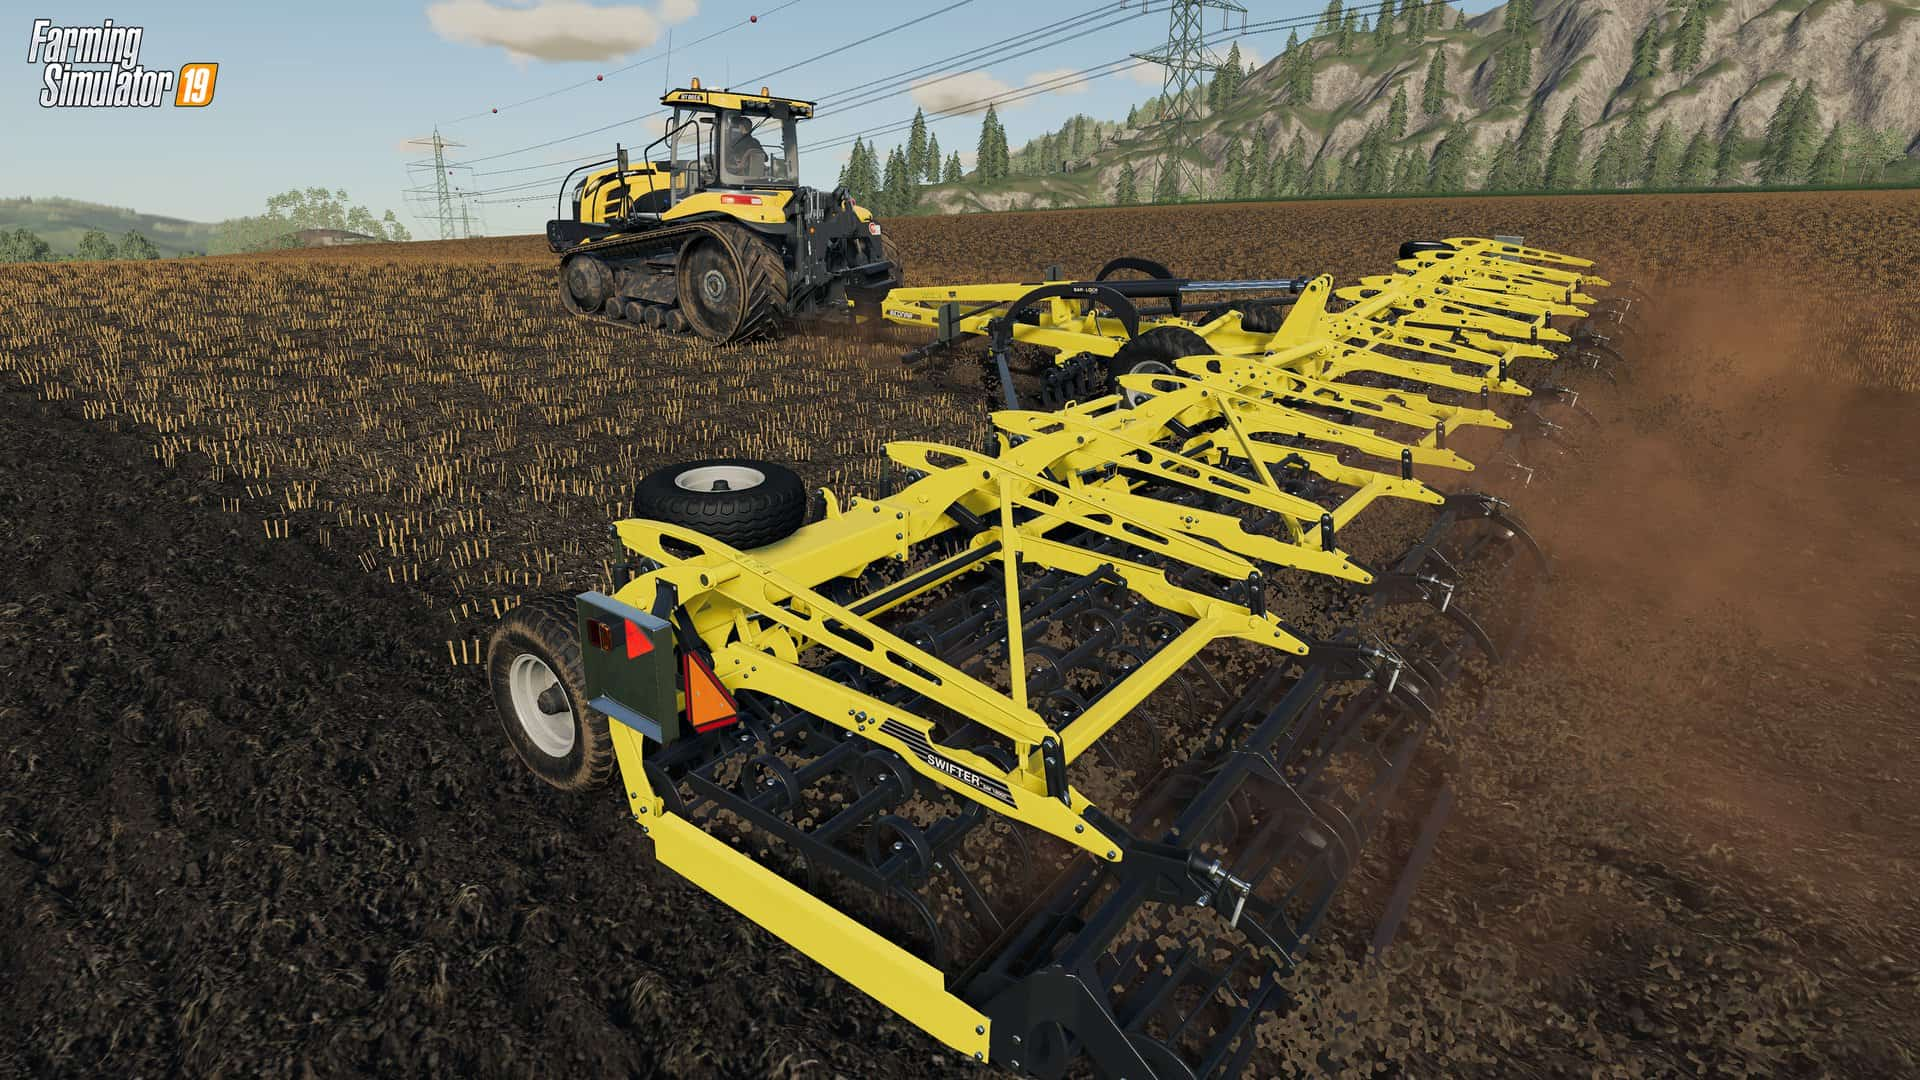 Farming Simulator 19 will have BEDNAR FMT - Farming Simulator 19 Mod